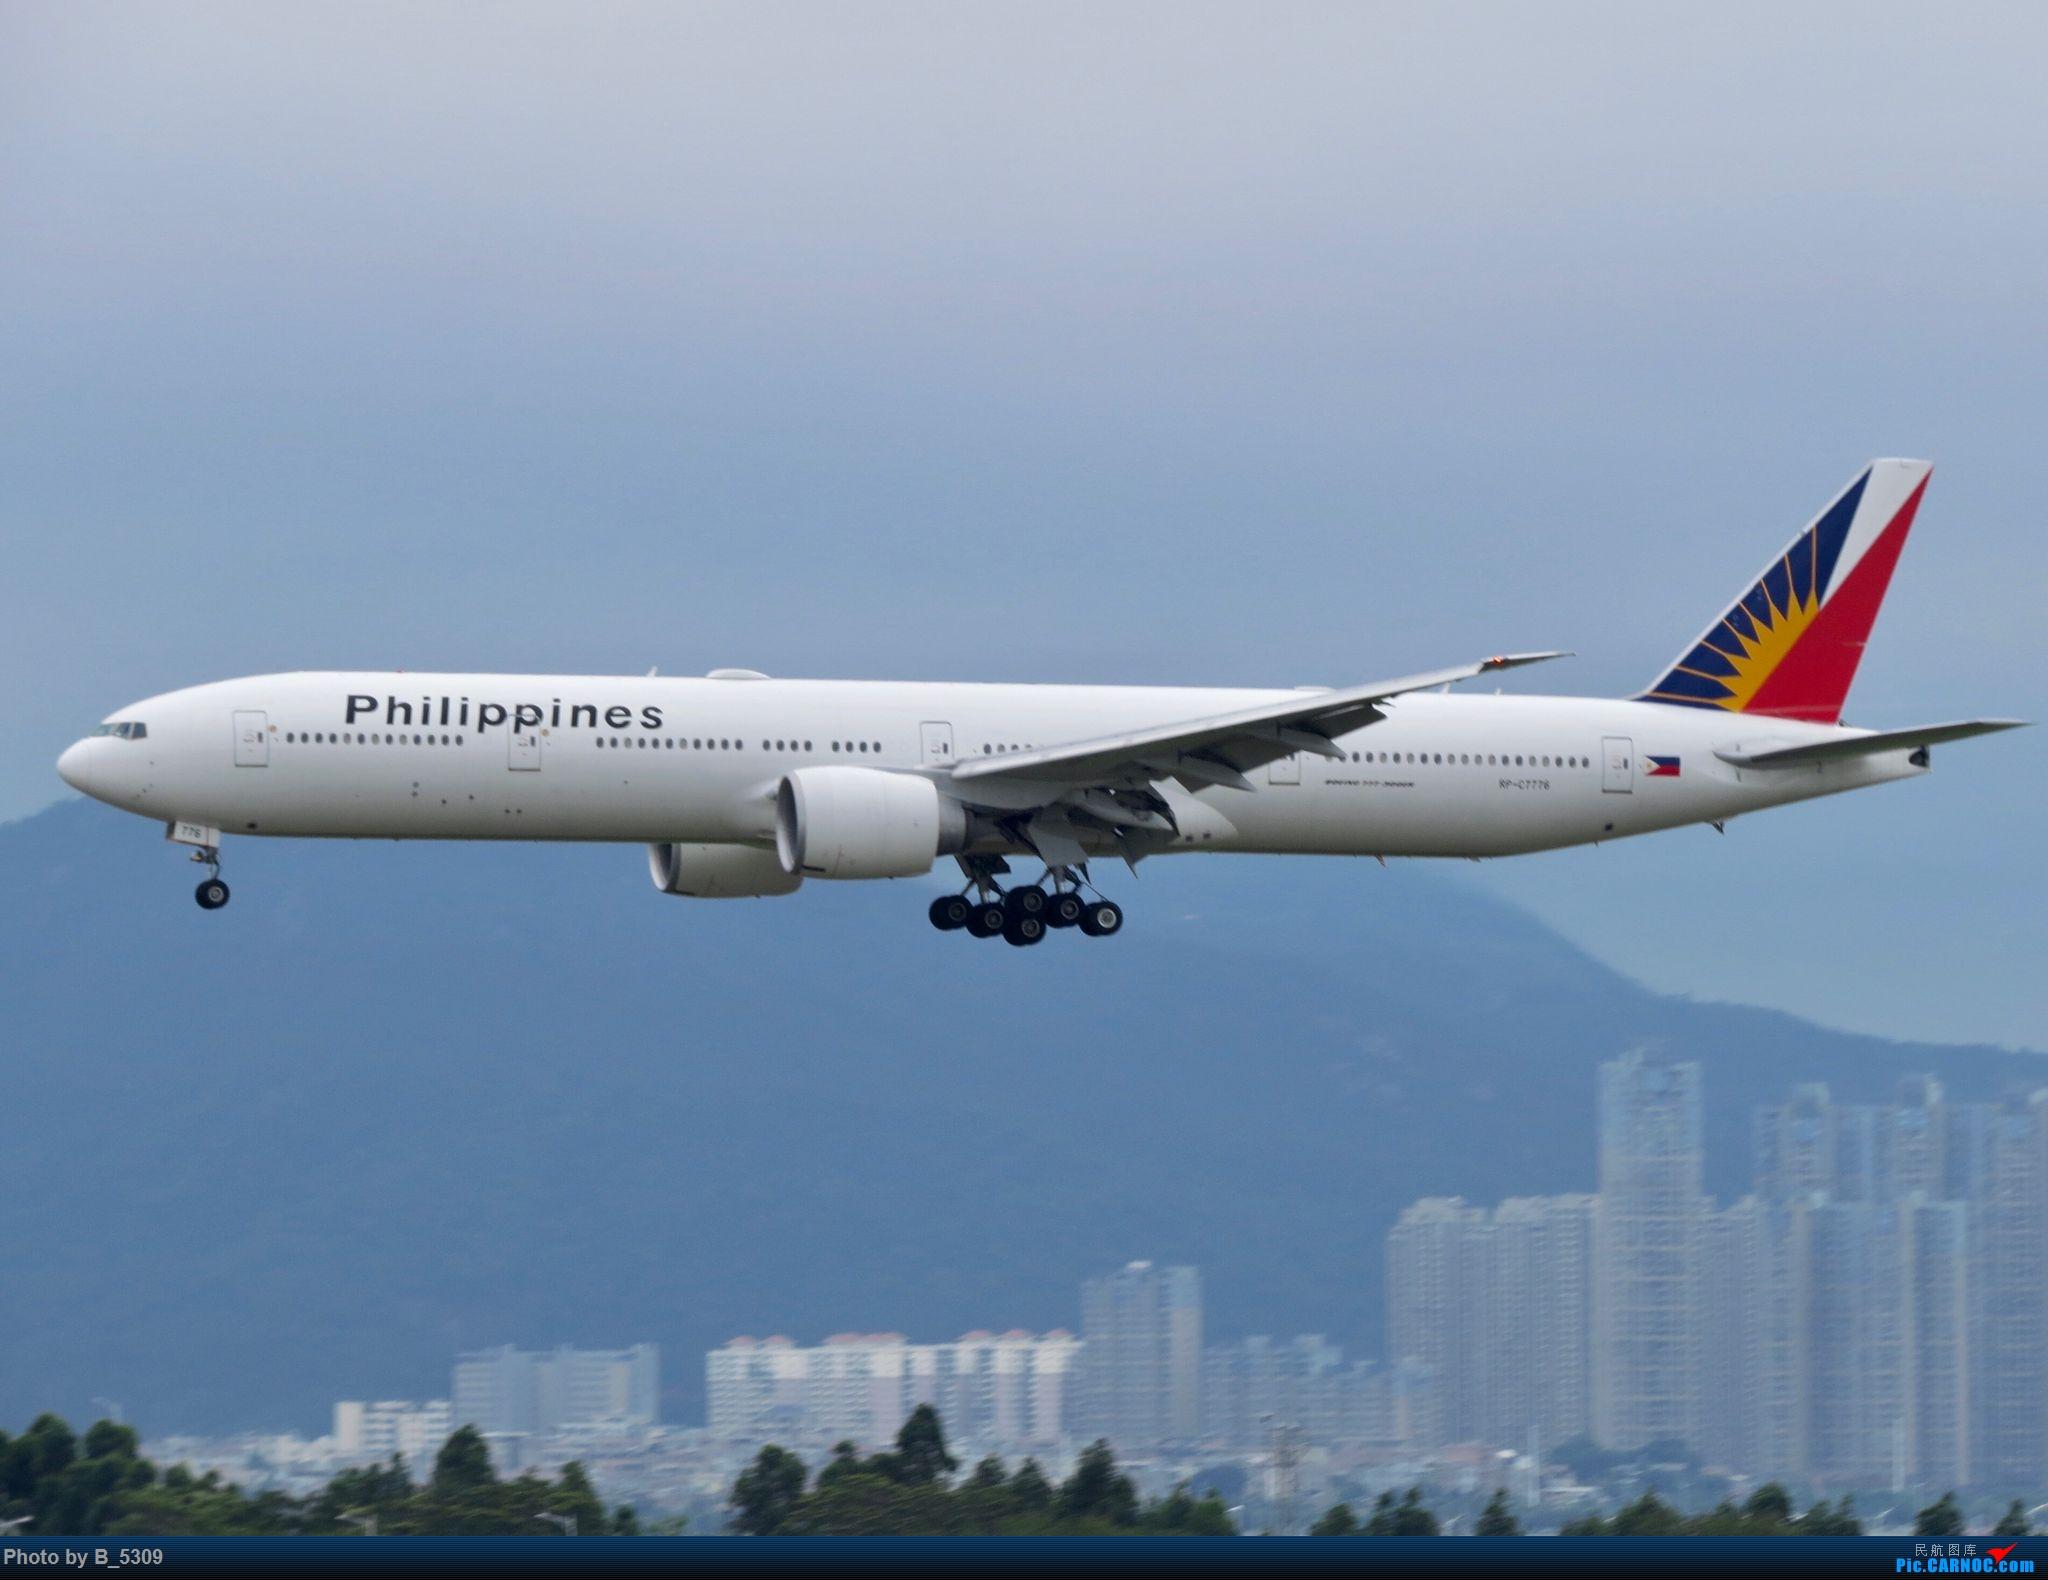 Re:[原创]复课一个月了,终于能在紧张的学习生活中抽出点时间拍稽~ BOEING 777-300ER RP-C7776 中国厦门高崎国际机场